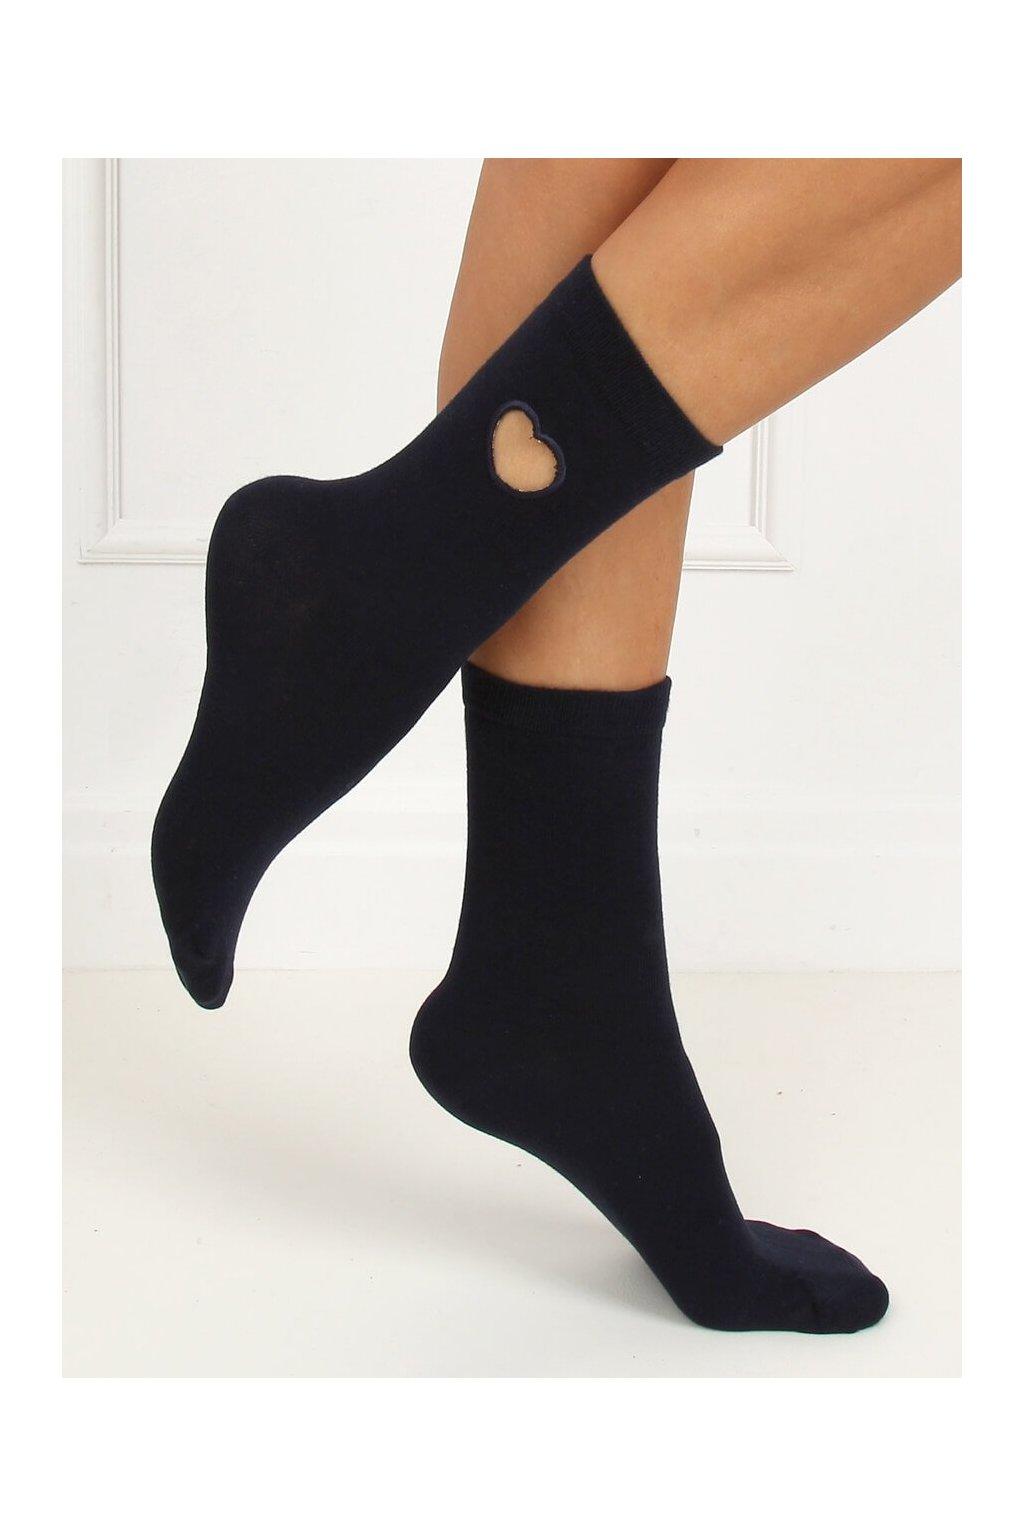 Damske ponožky modré SK-NPX95